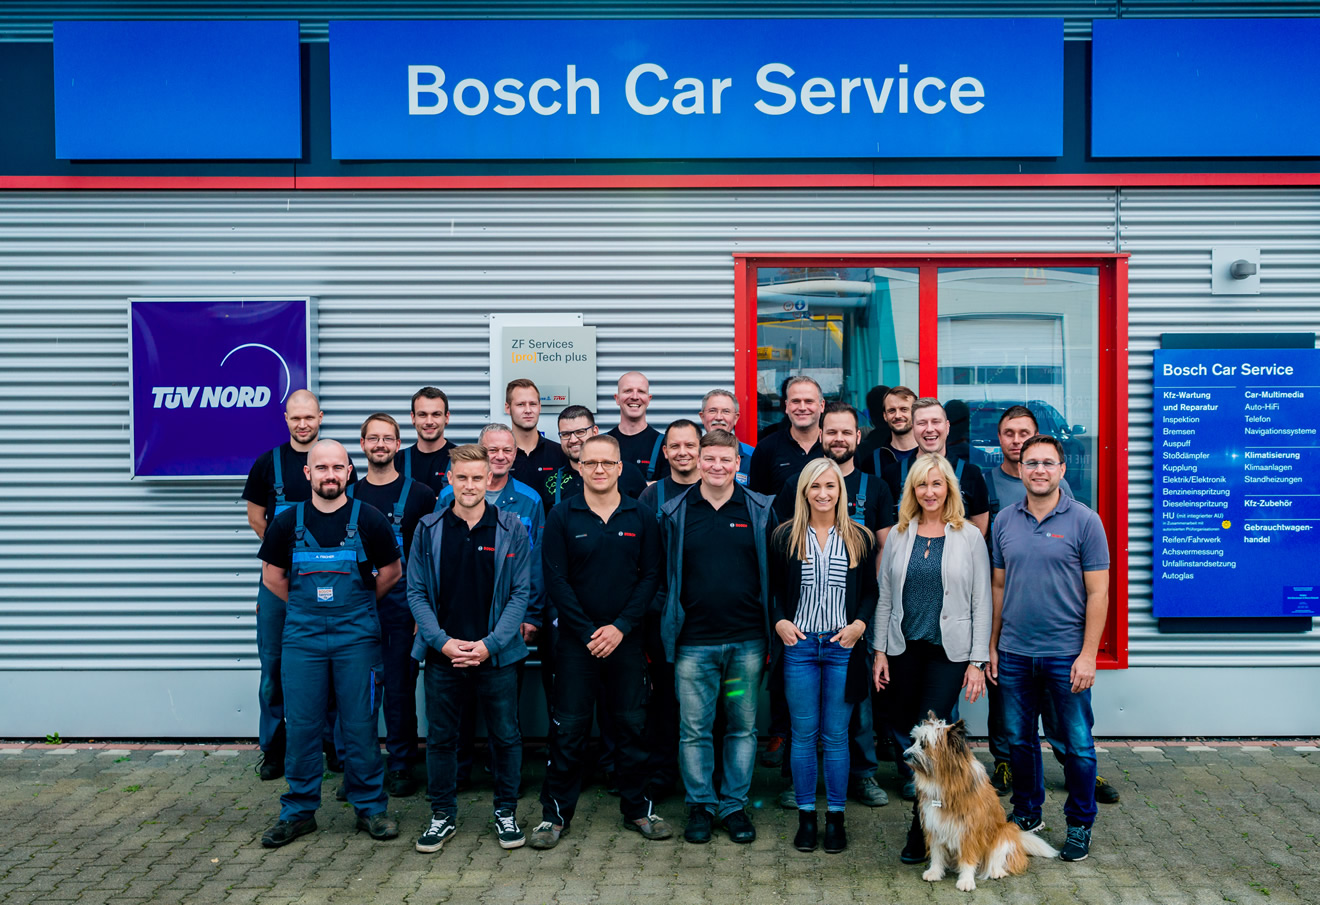 Bosch Kühlschrank Hotline : Team bosch car service schkeuditz